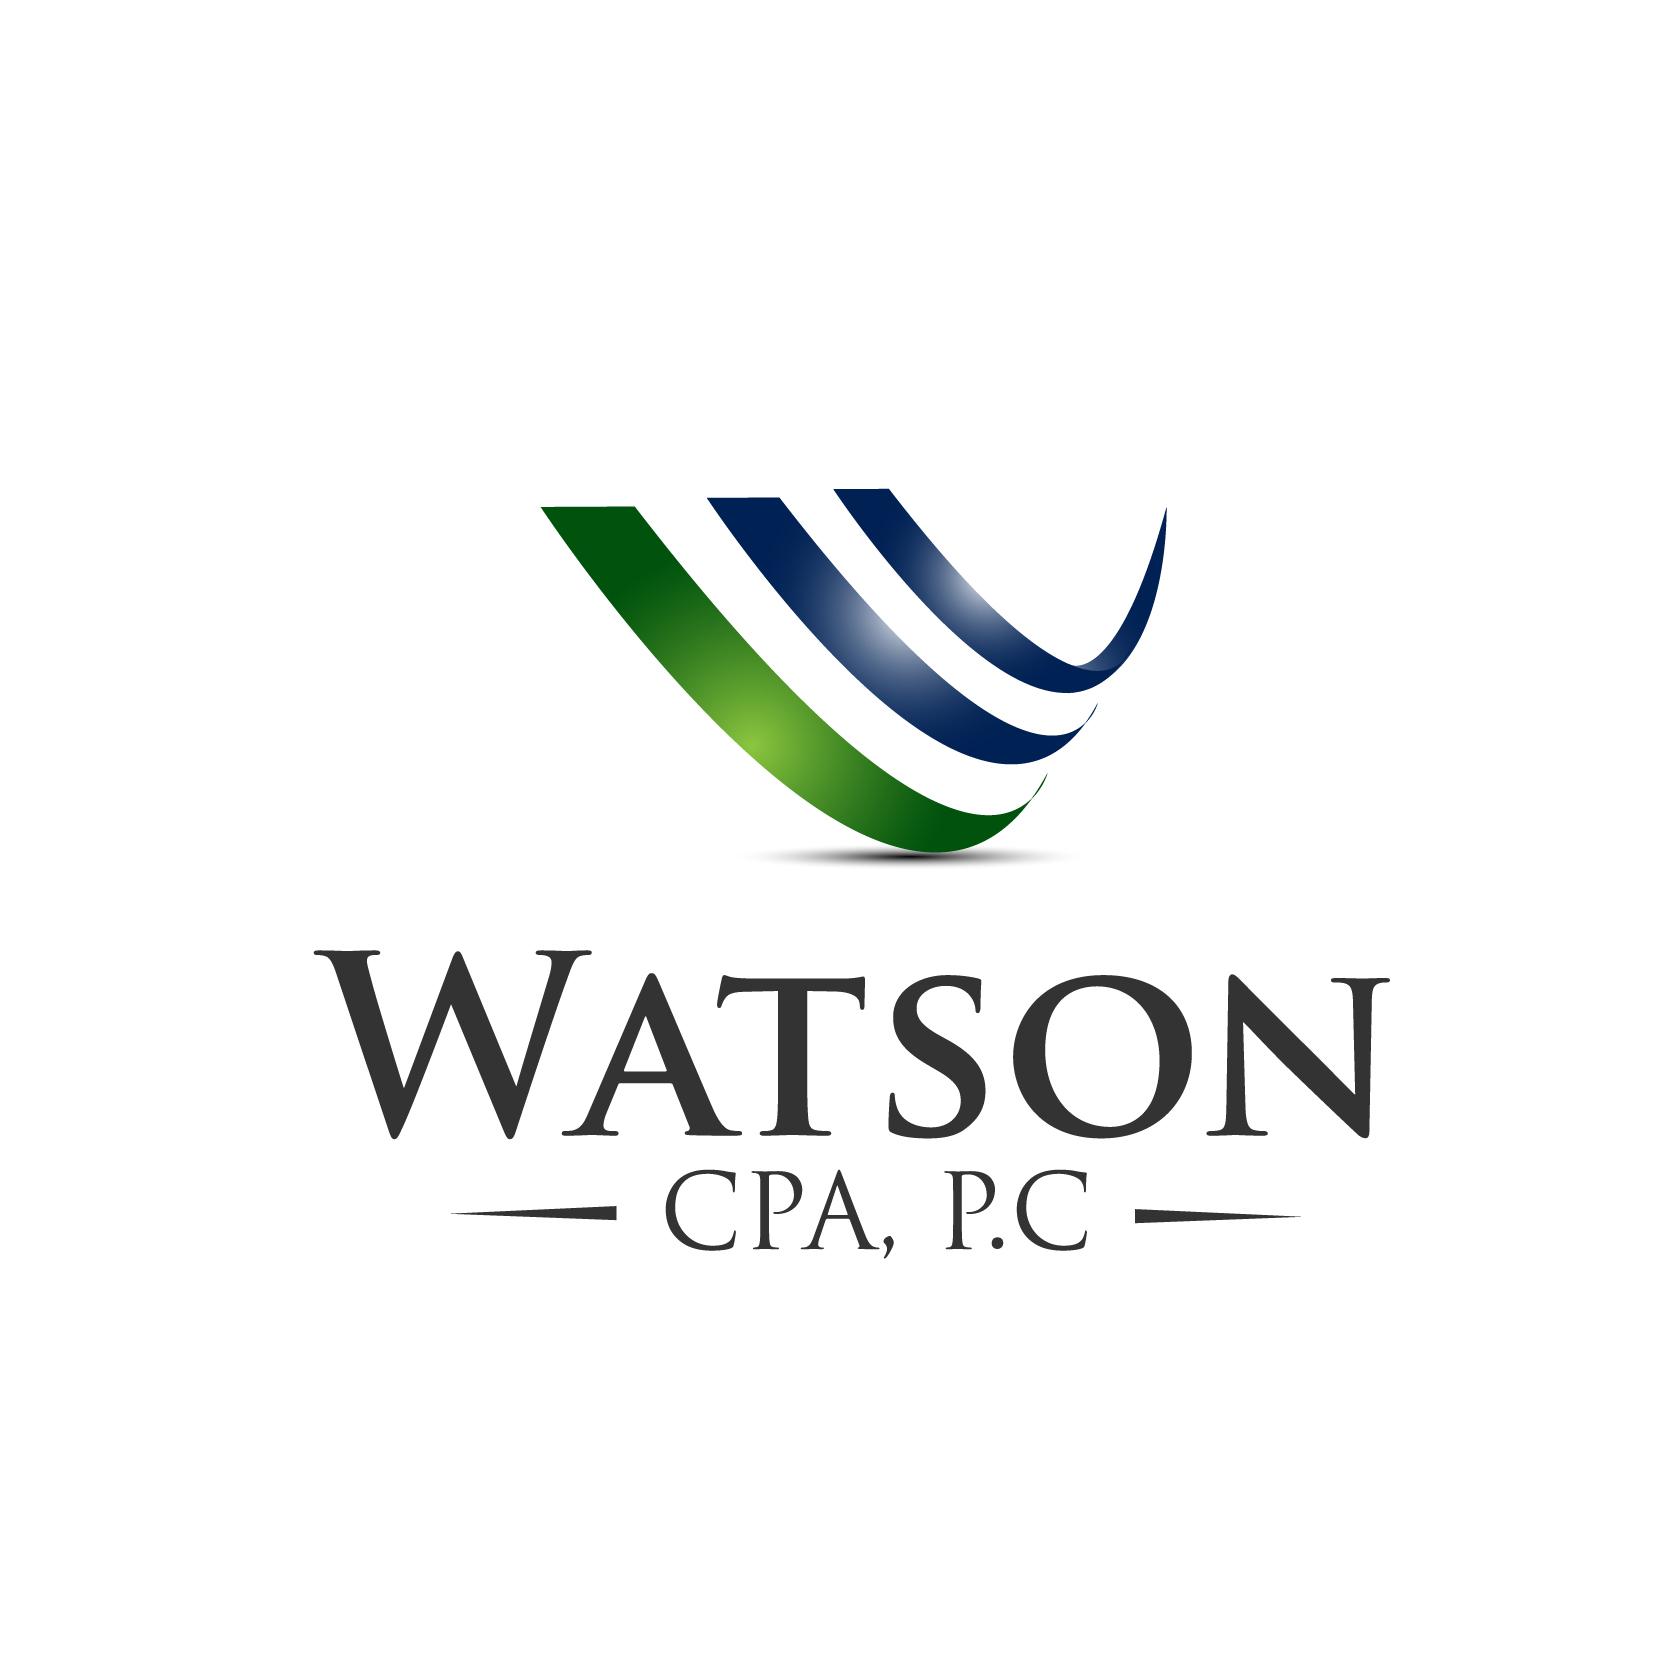 Watson CPA, P.C.